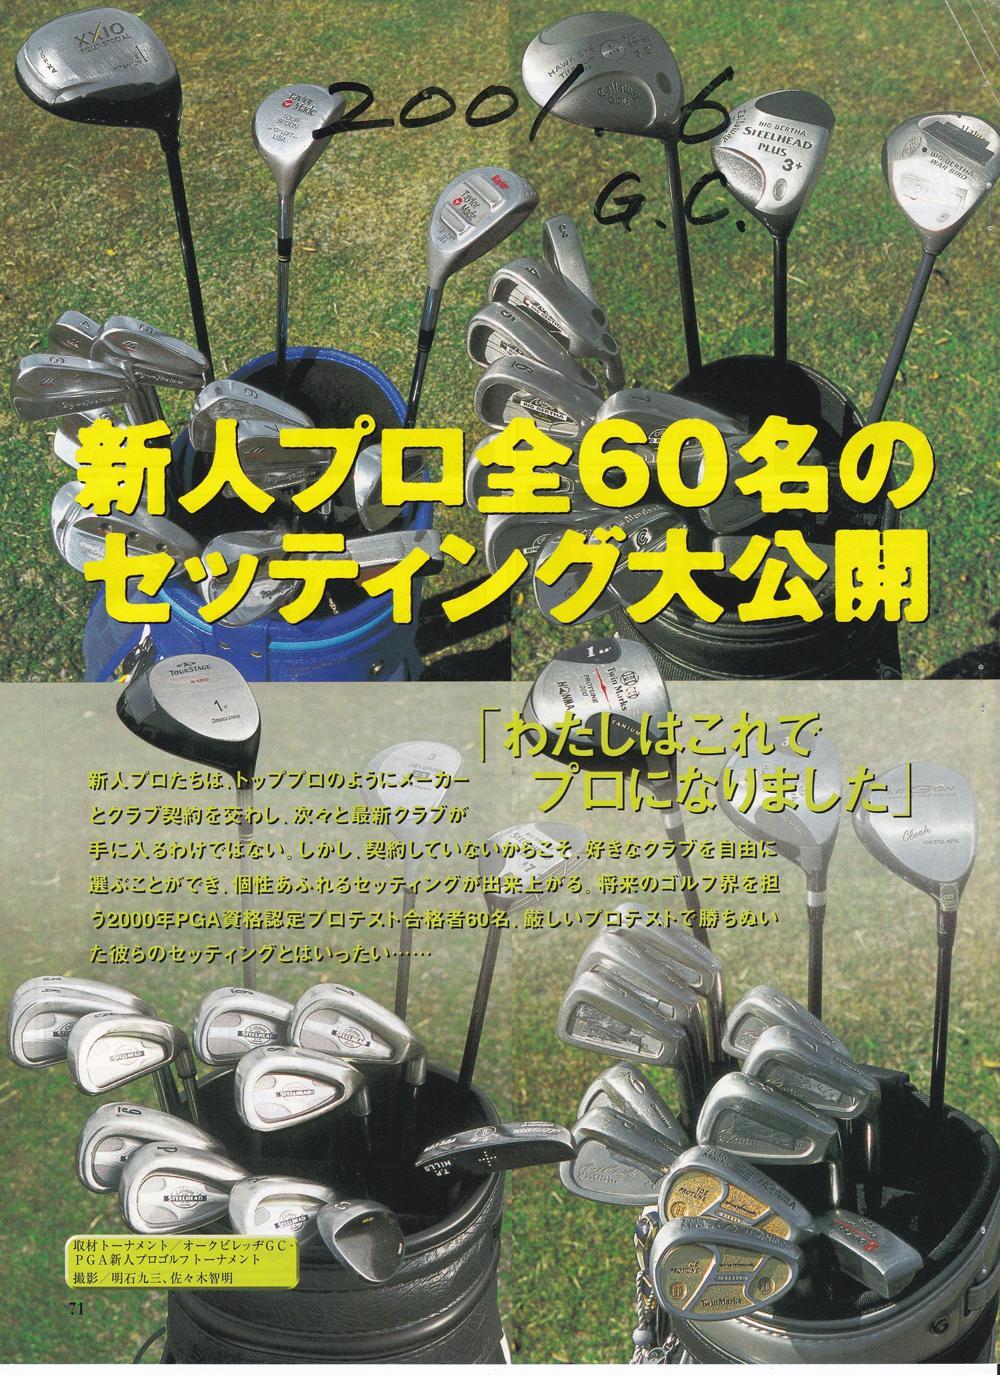 2001.6 Golf Classic